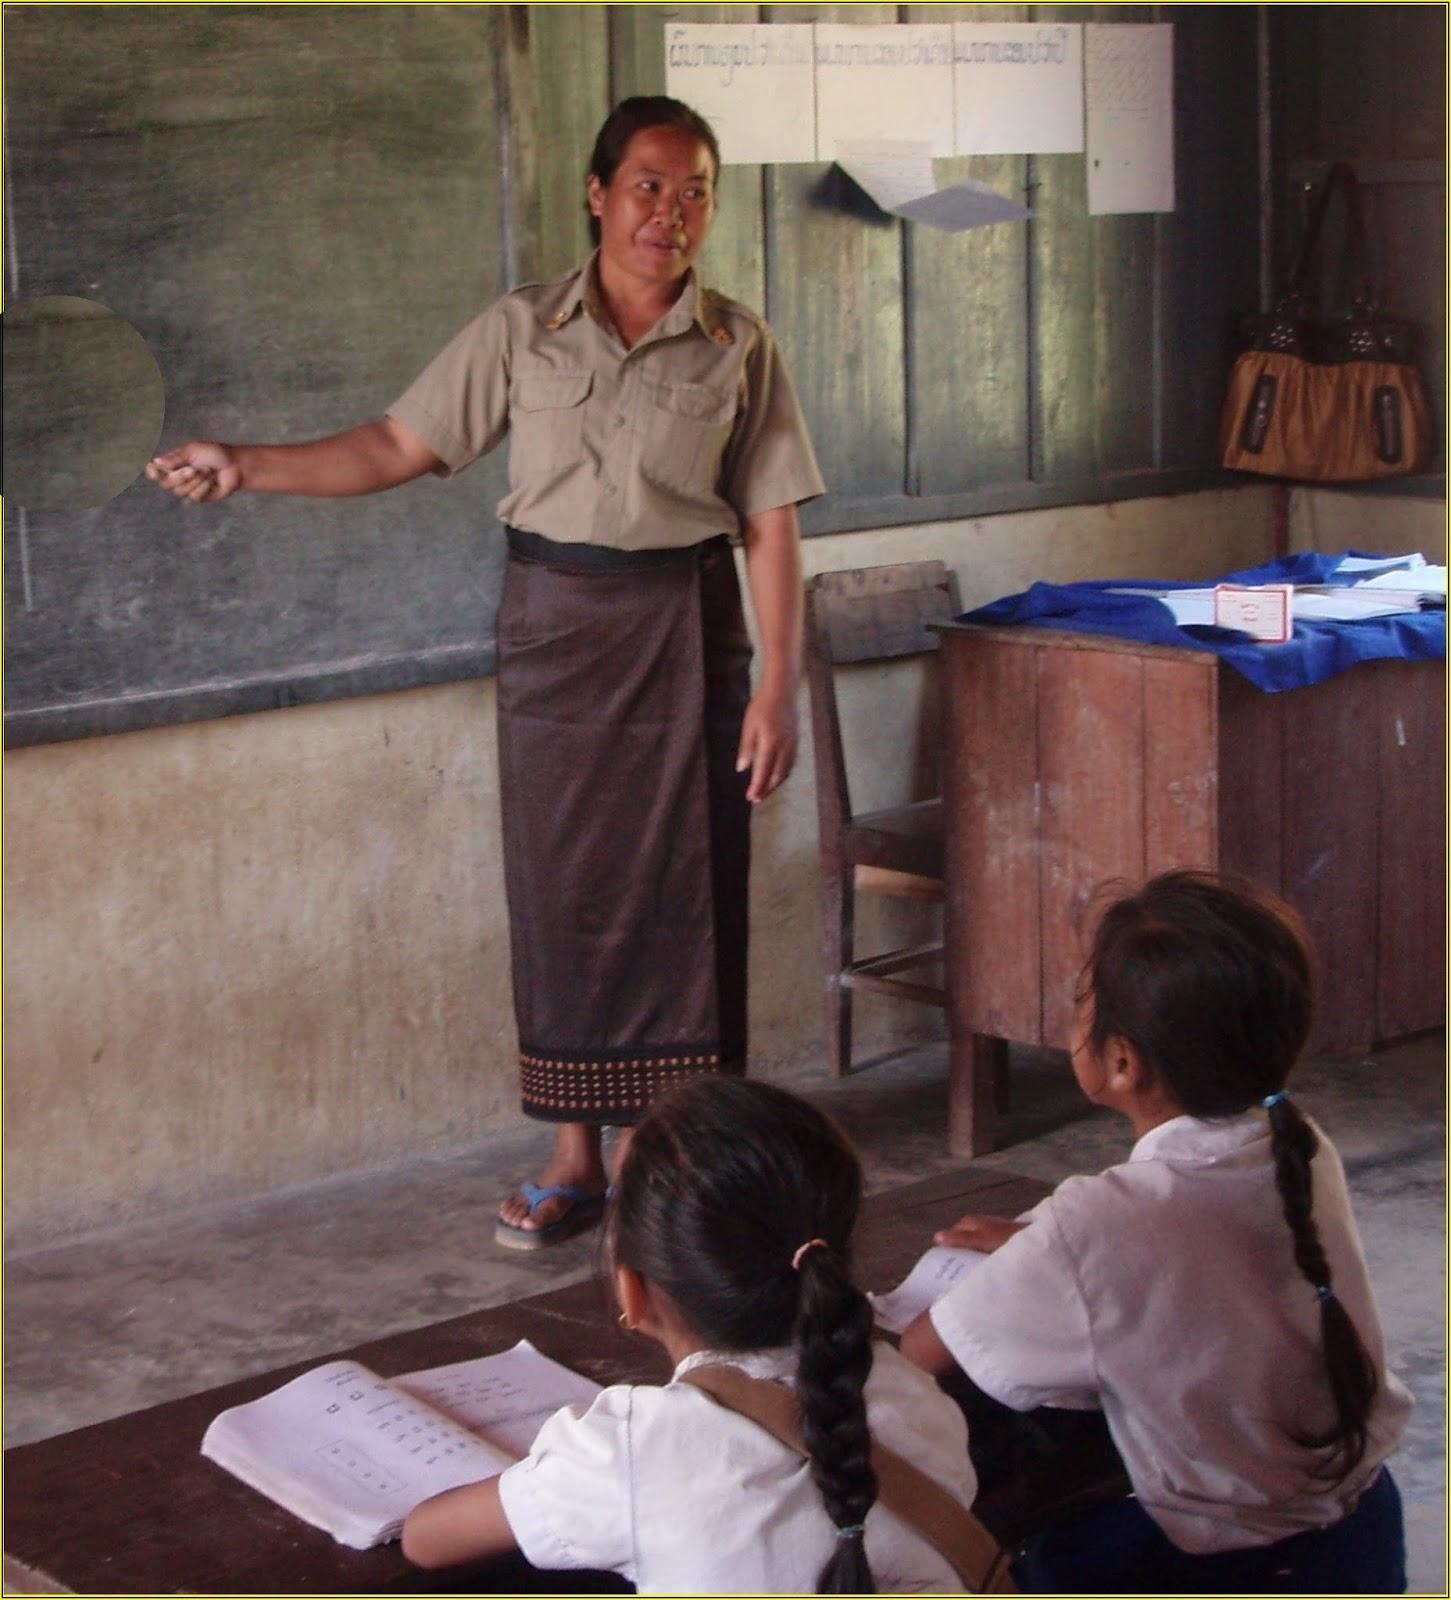 Menjadi Guru Positif, Guru Pembelajar atau Guru Profesional